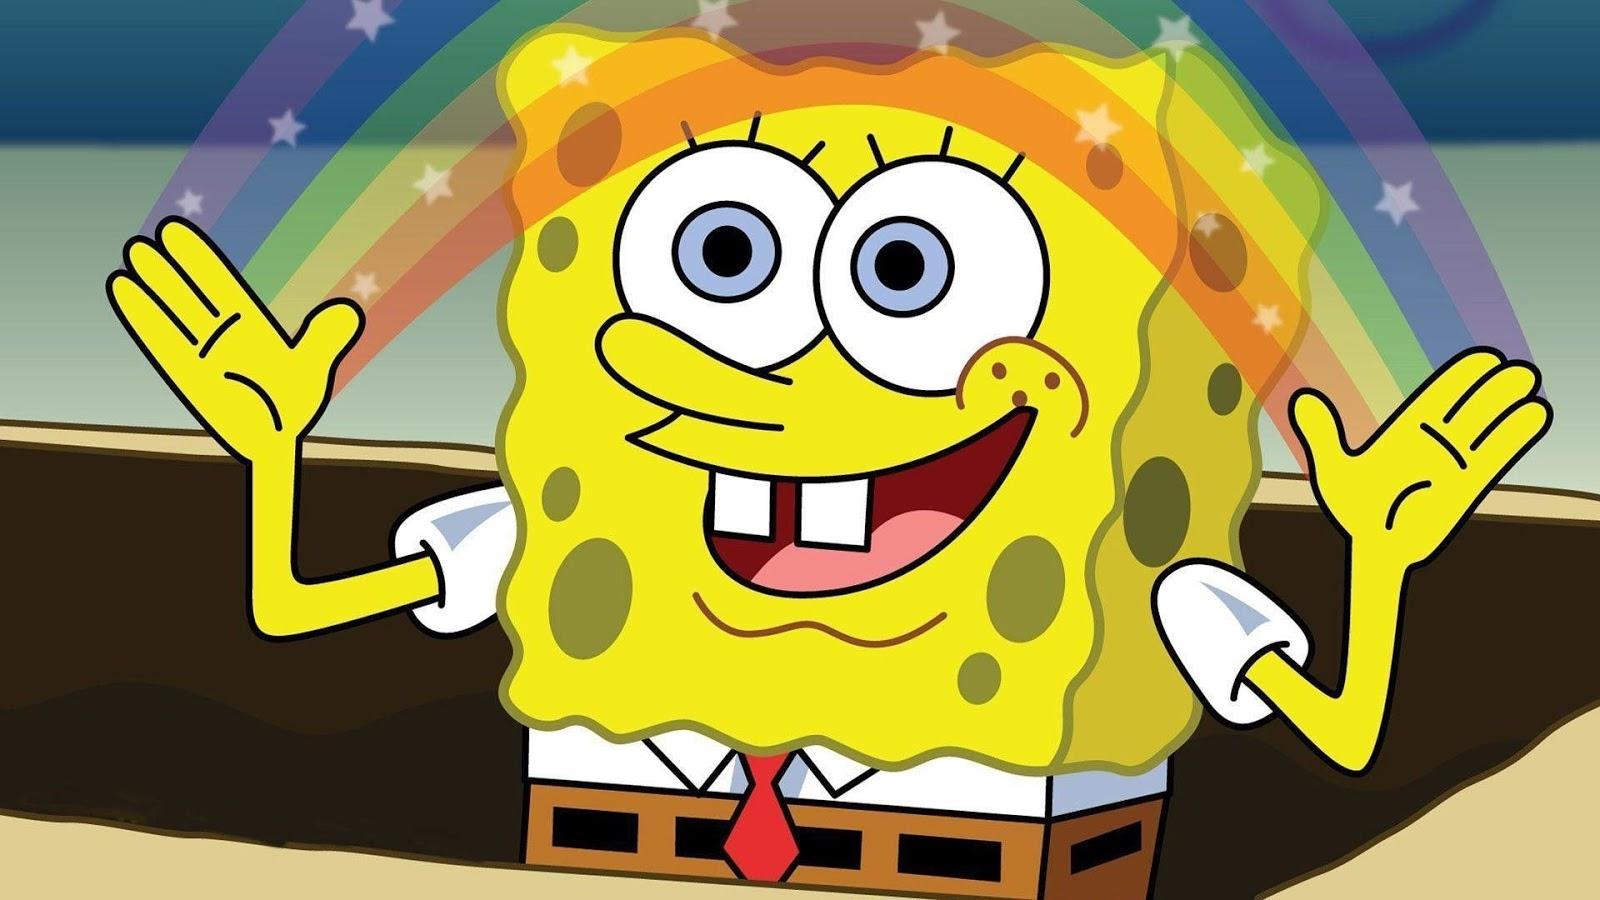 Raw Meme SpongeBob: Imagination